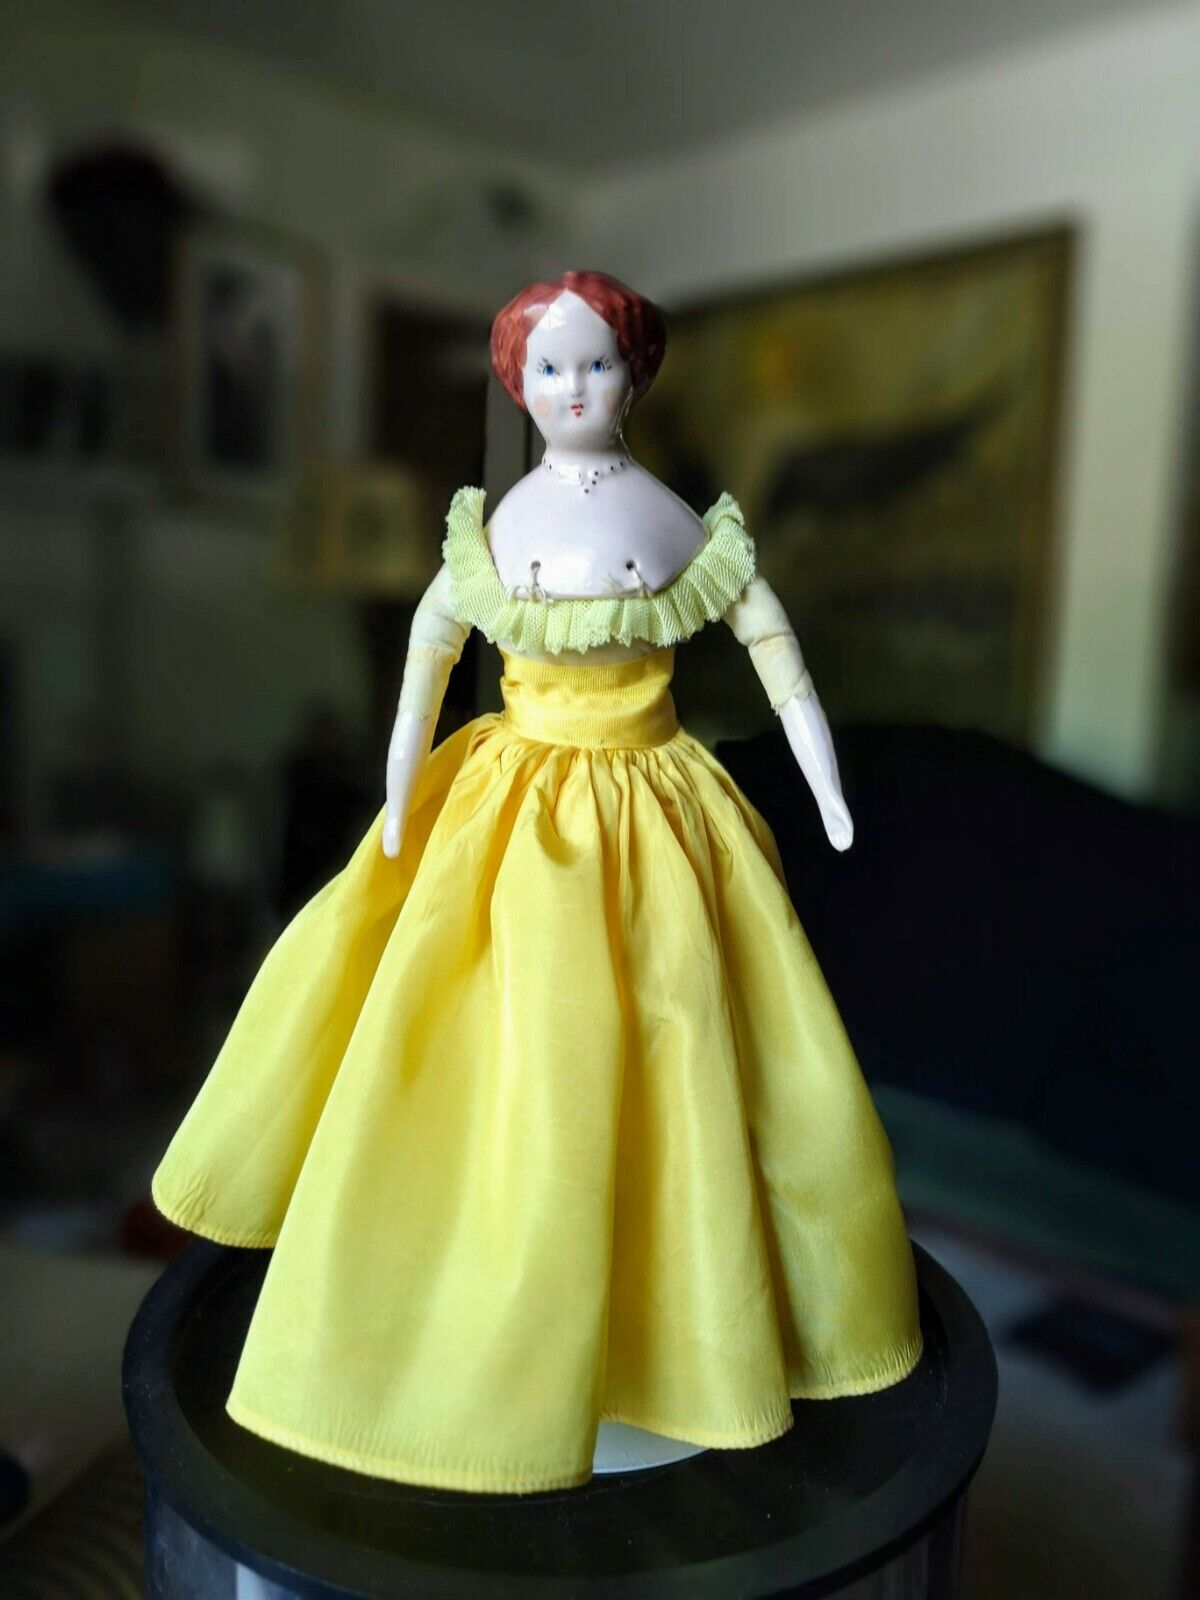 Vintage 12  Ruth Gibbs Pelo Castaño rosado Muñeca De Porcelana vestido de oro